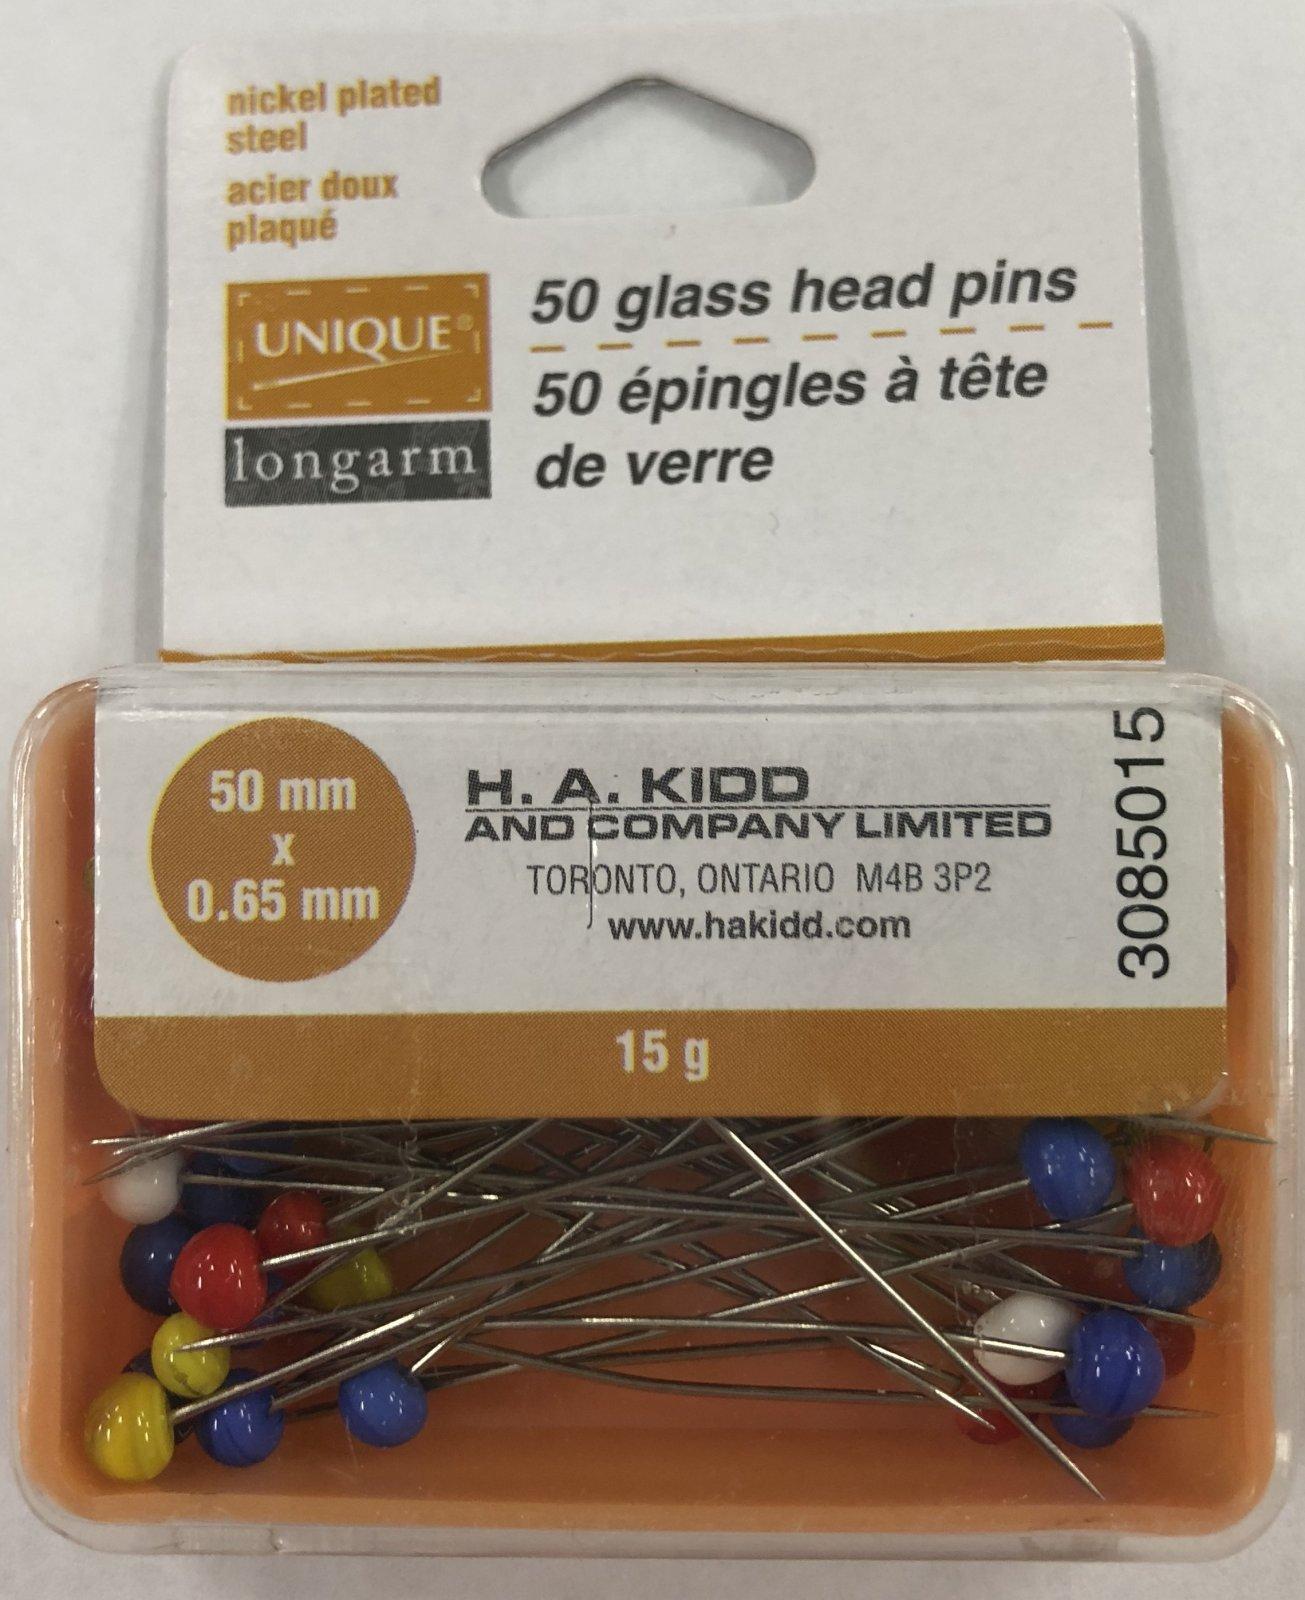 UNIQUE LONGARM Glass Head Quilting Pins 50 pcs - 50mm (2)